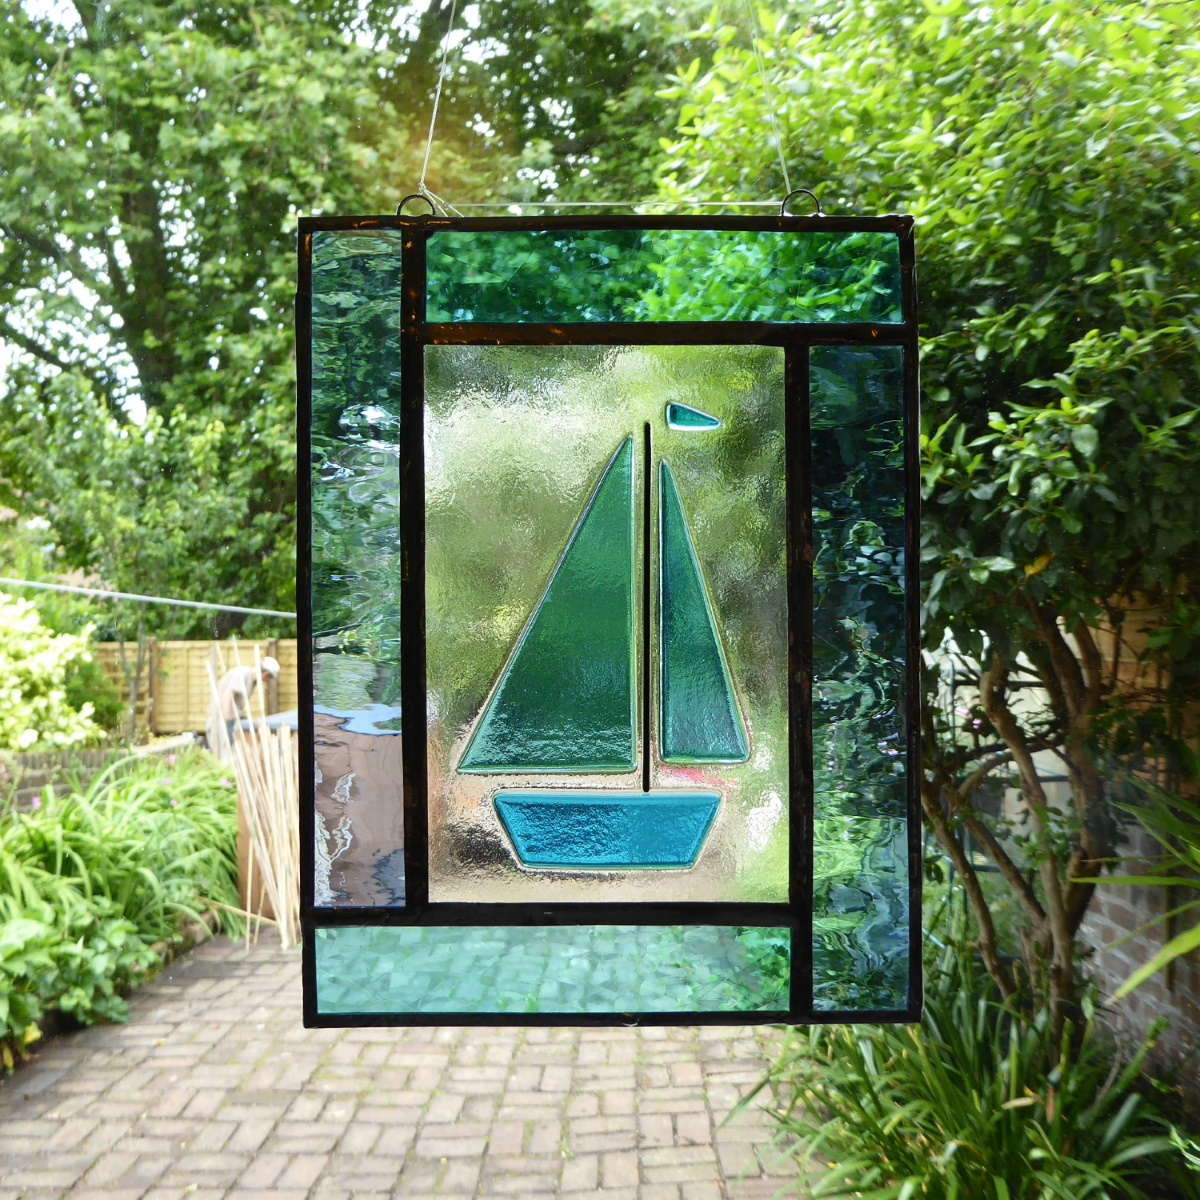 Blue sailboat window panel